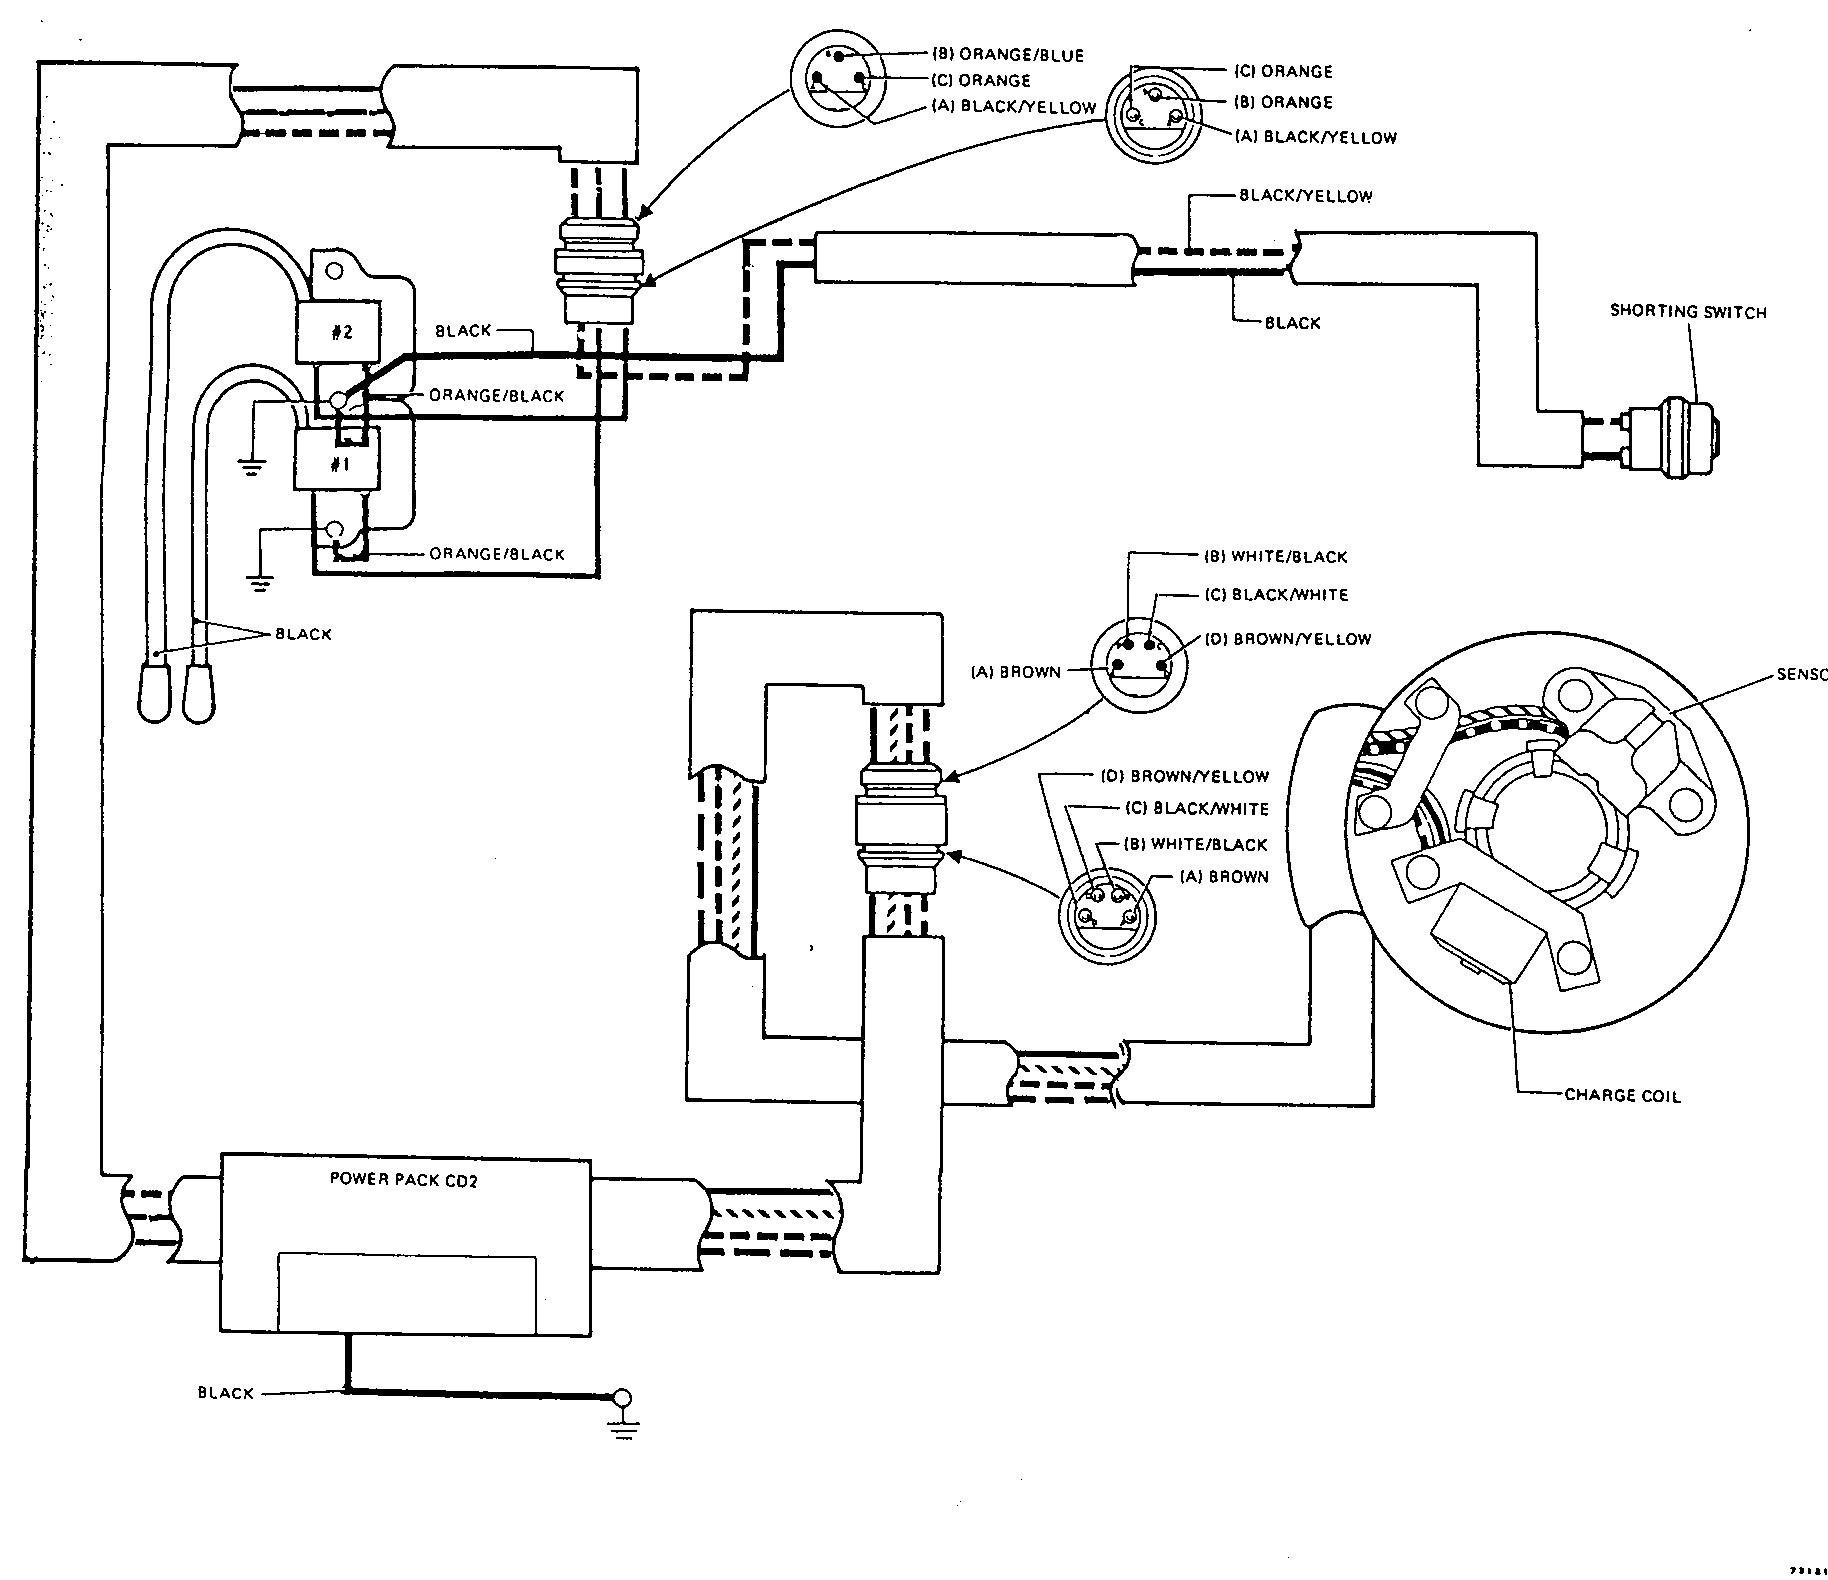 Starter Solenoid Wiring Diagram Manual Save Manual Motor Starter Wiring Diagram 3 Phase Contactor Inside